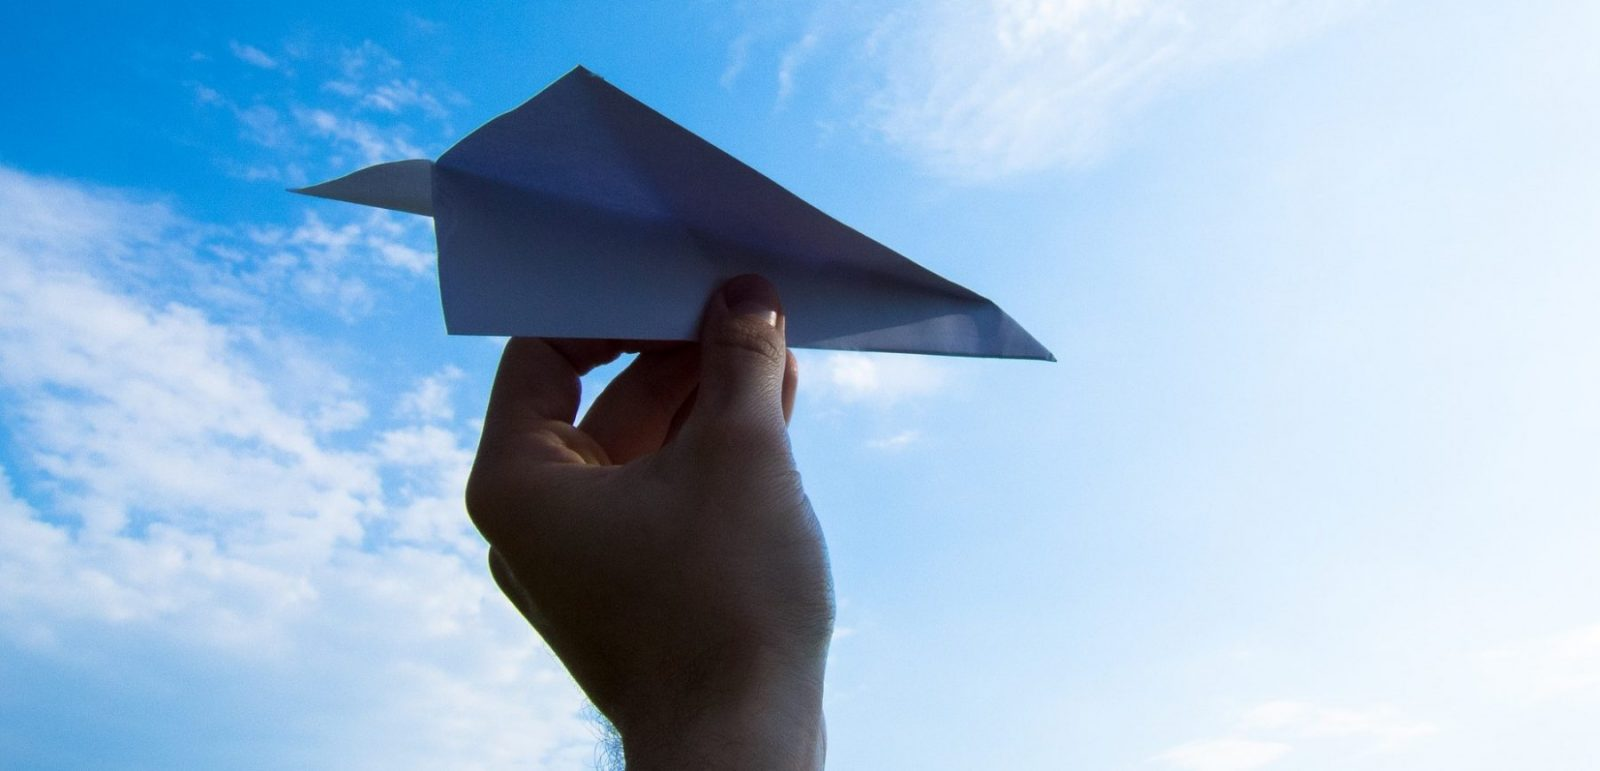 papier vliegtuig